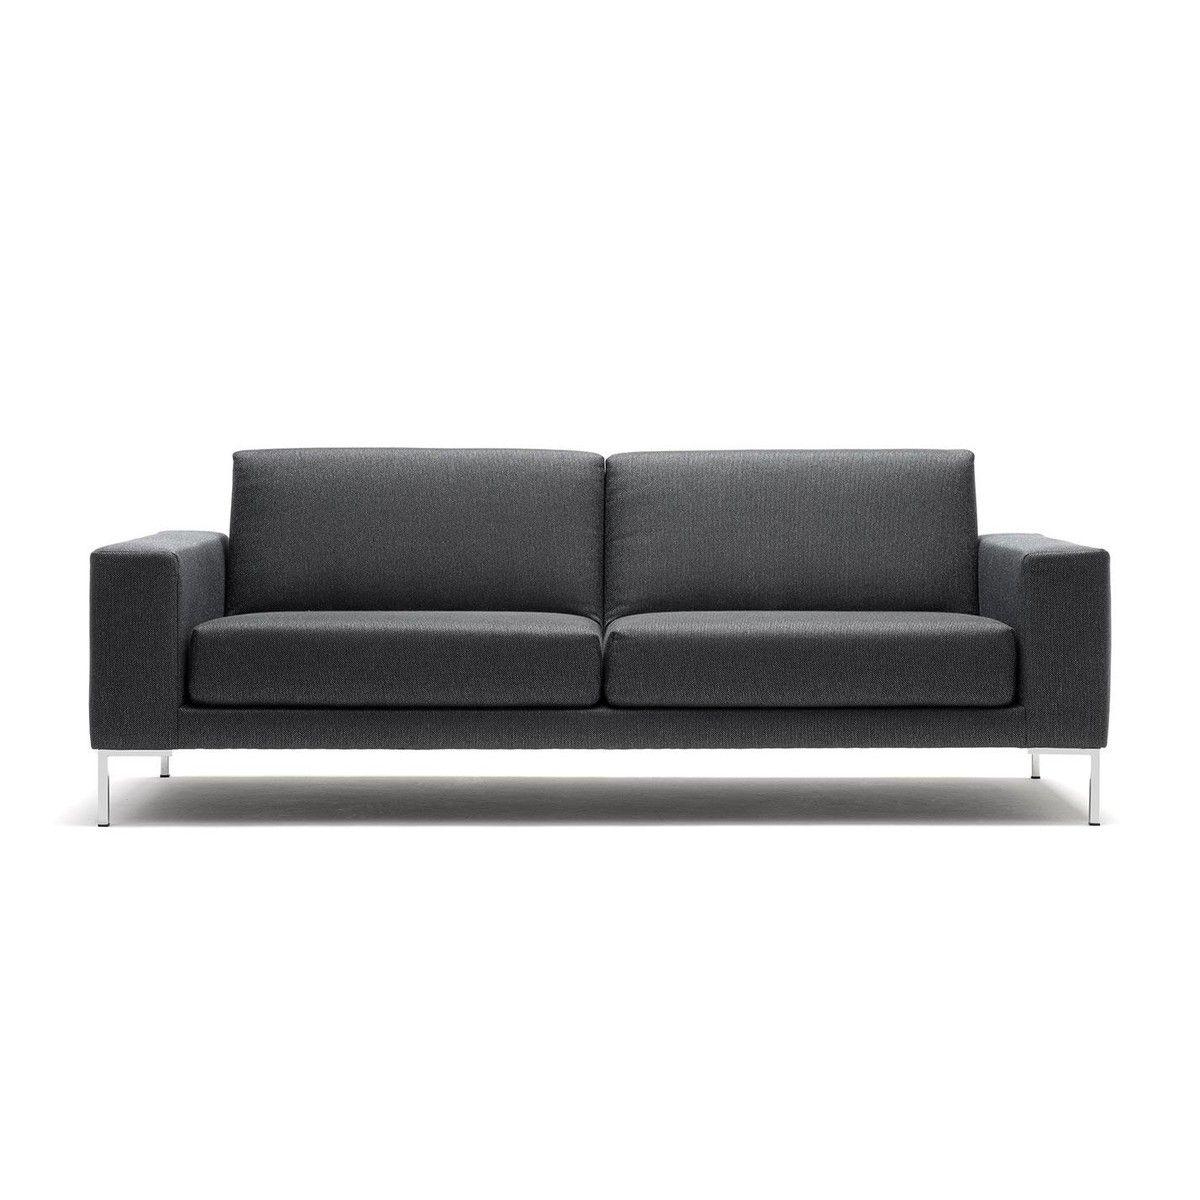 freistil Rolf Benz - freistil 183 3-Sitzer Sofa - graubeige/Stoff Hallingdal 65 173/7804/Gestell Winkelfuß glanzchrom/204x84cm